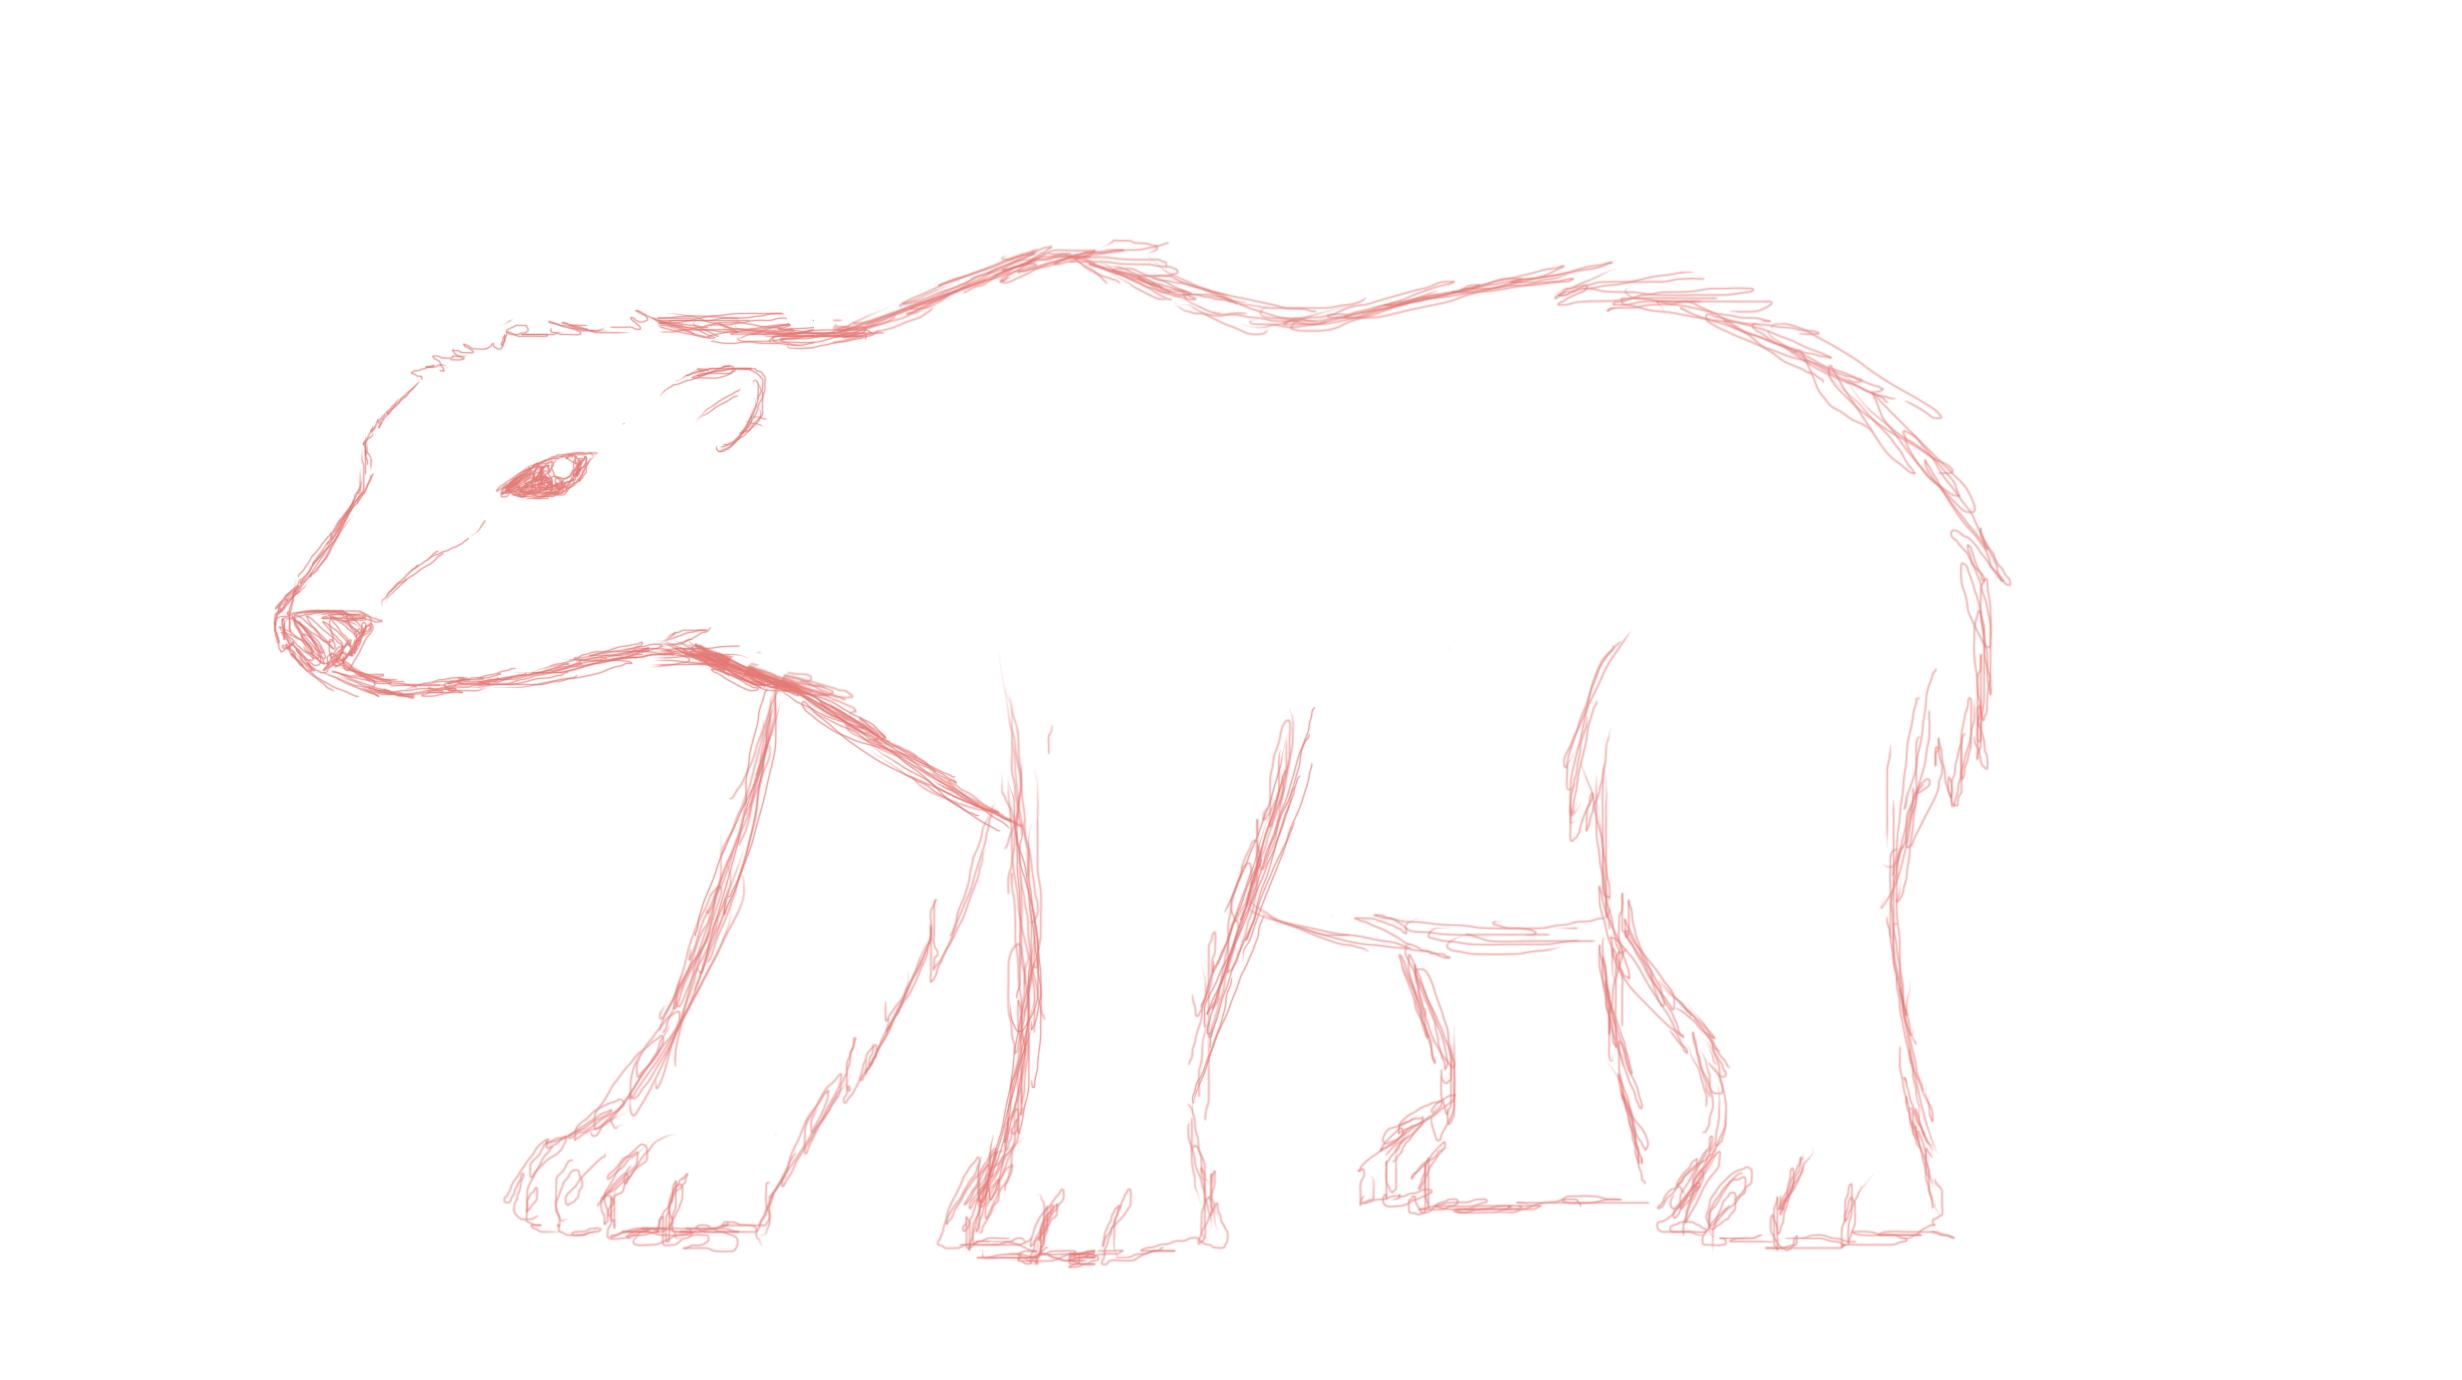 polar bear sketch 2 by fatherbrouny on deviantart